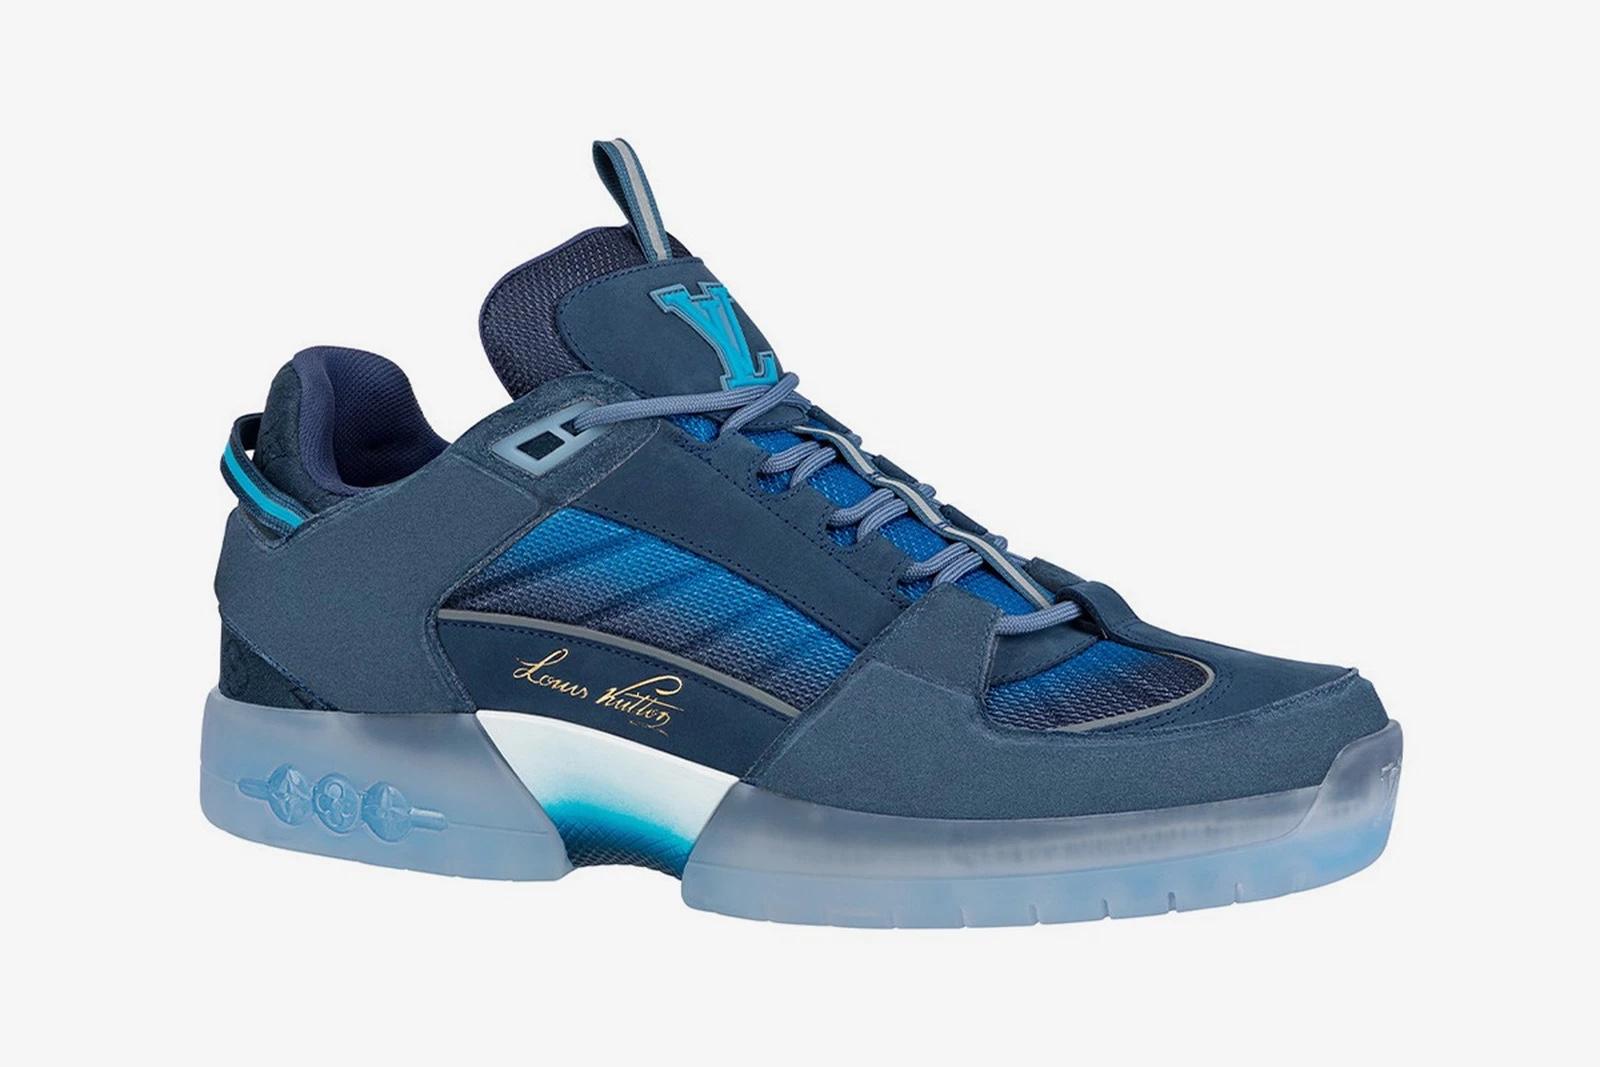 Lucien Clarke x Louis Vuitton sneakers